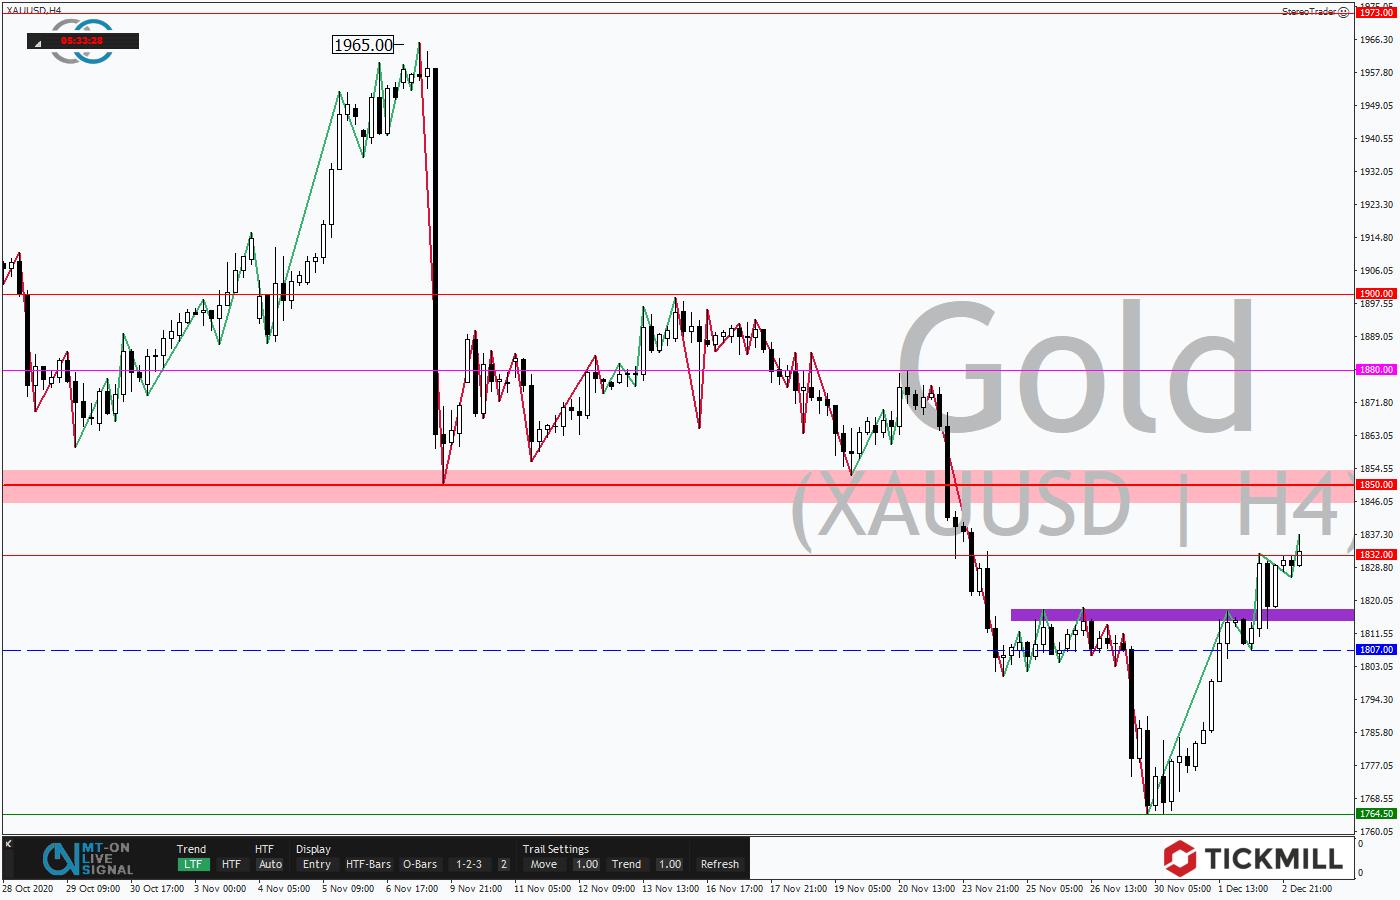 Tickmill-Analyse: Gold im 4-Stundenchart